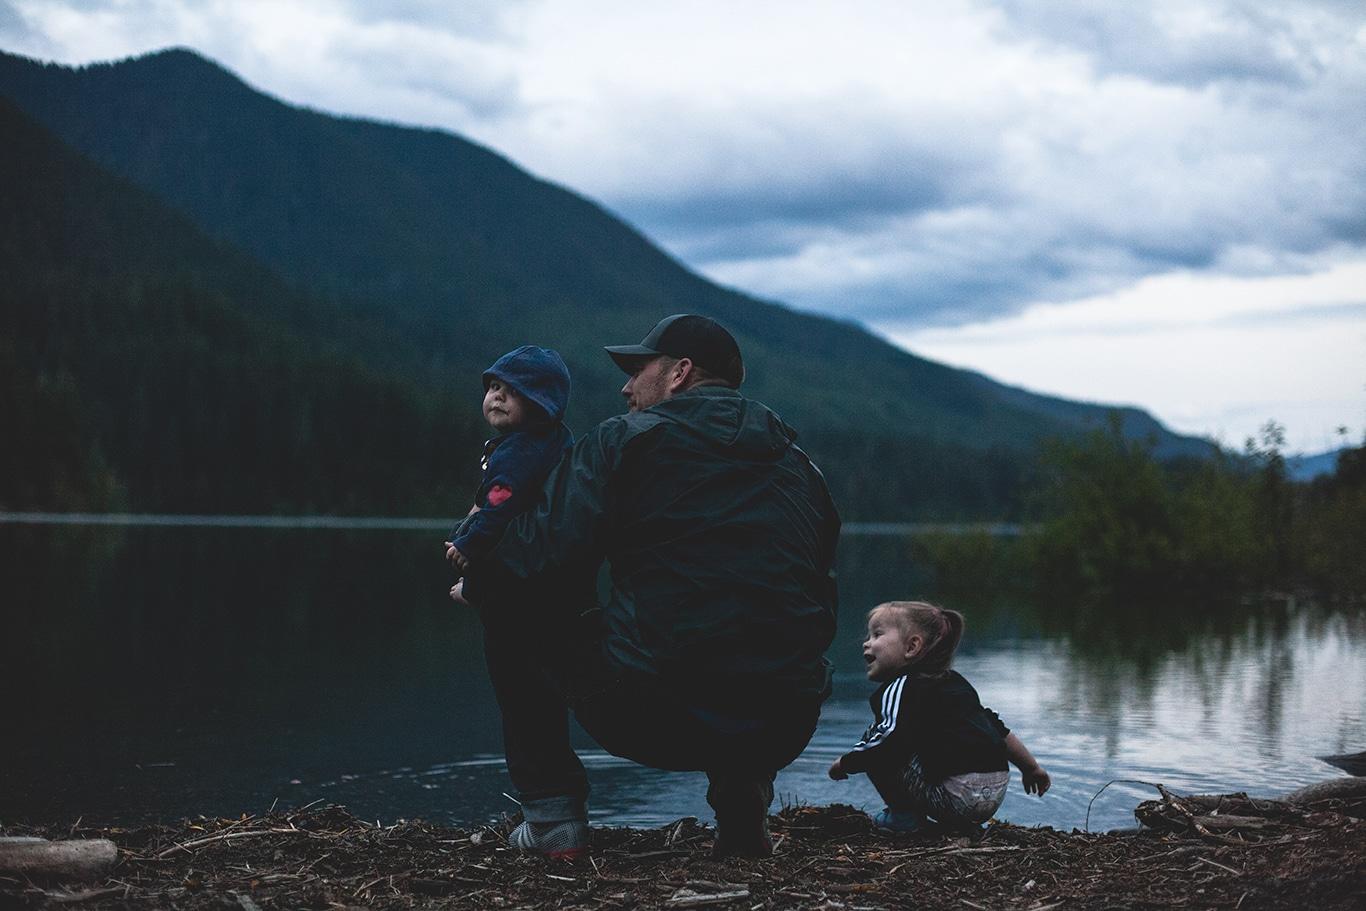 https://mk0boatsmartmulgyc50.kinstacdn.com/wp-content/uploads/2020/04/adult-baby-boy.jpg